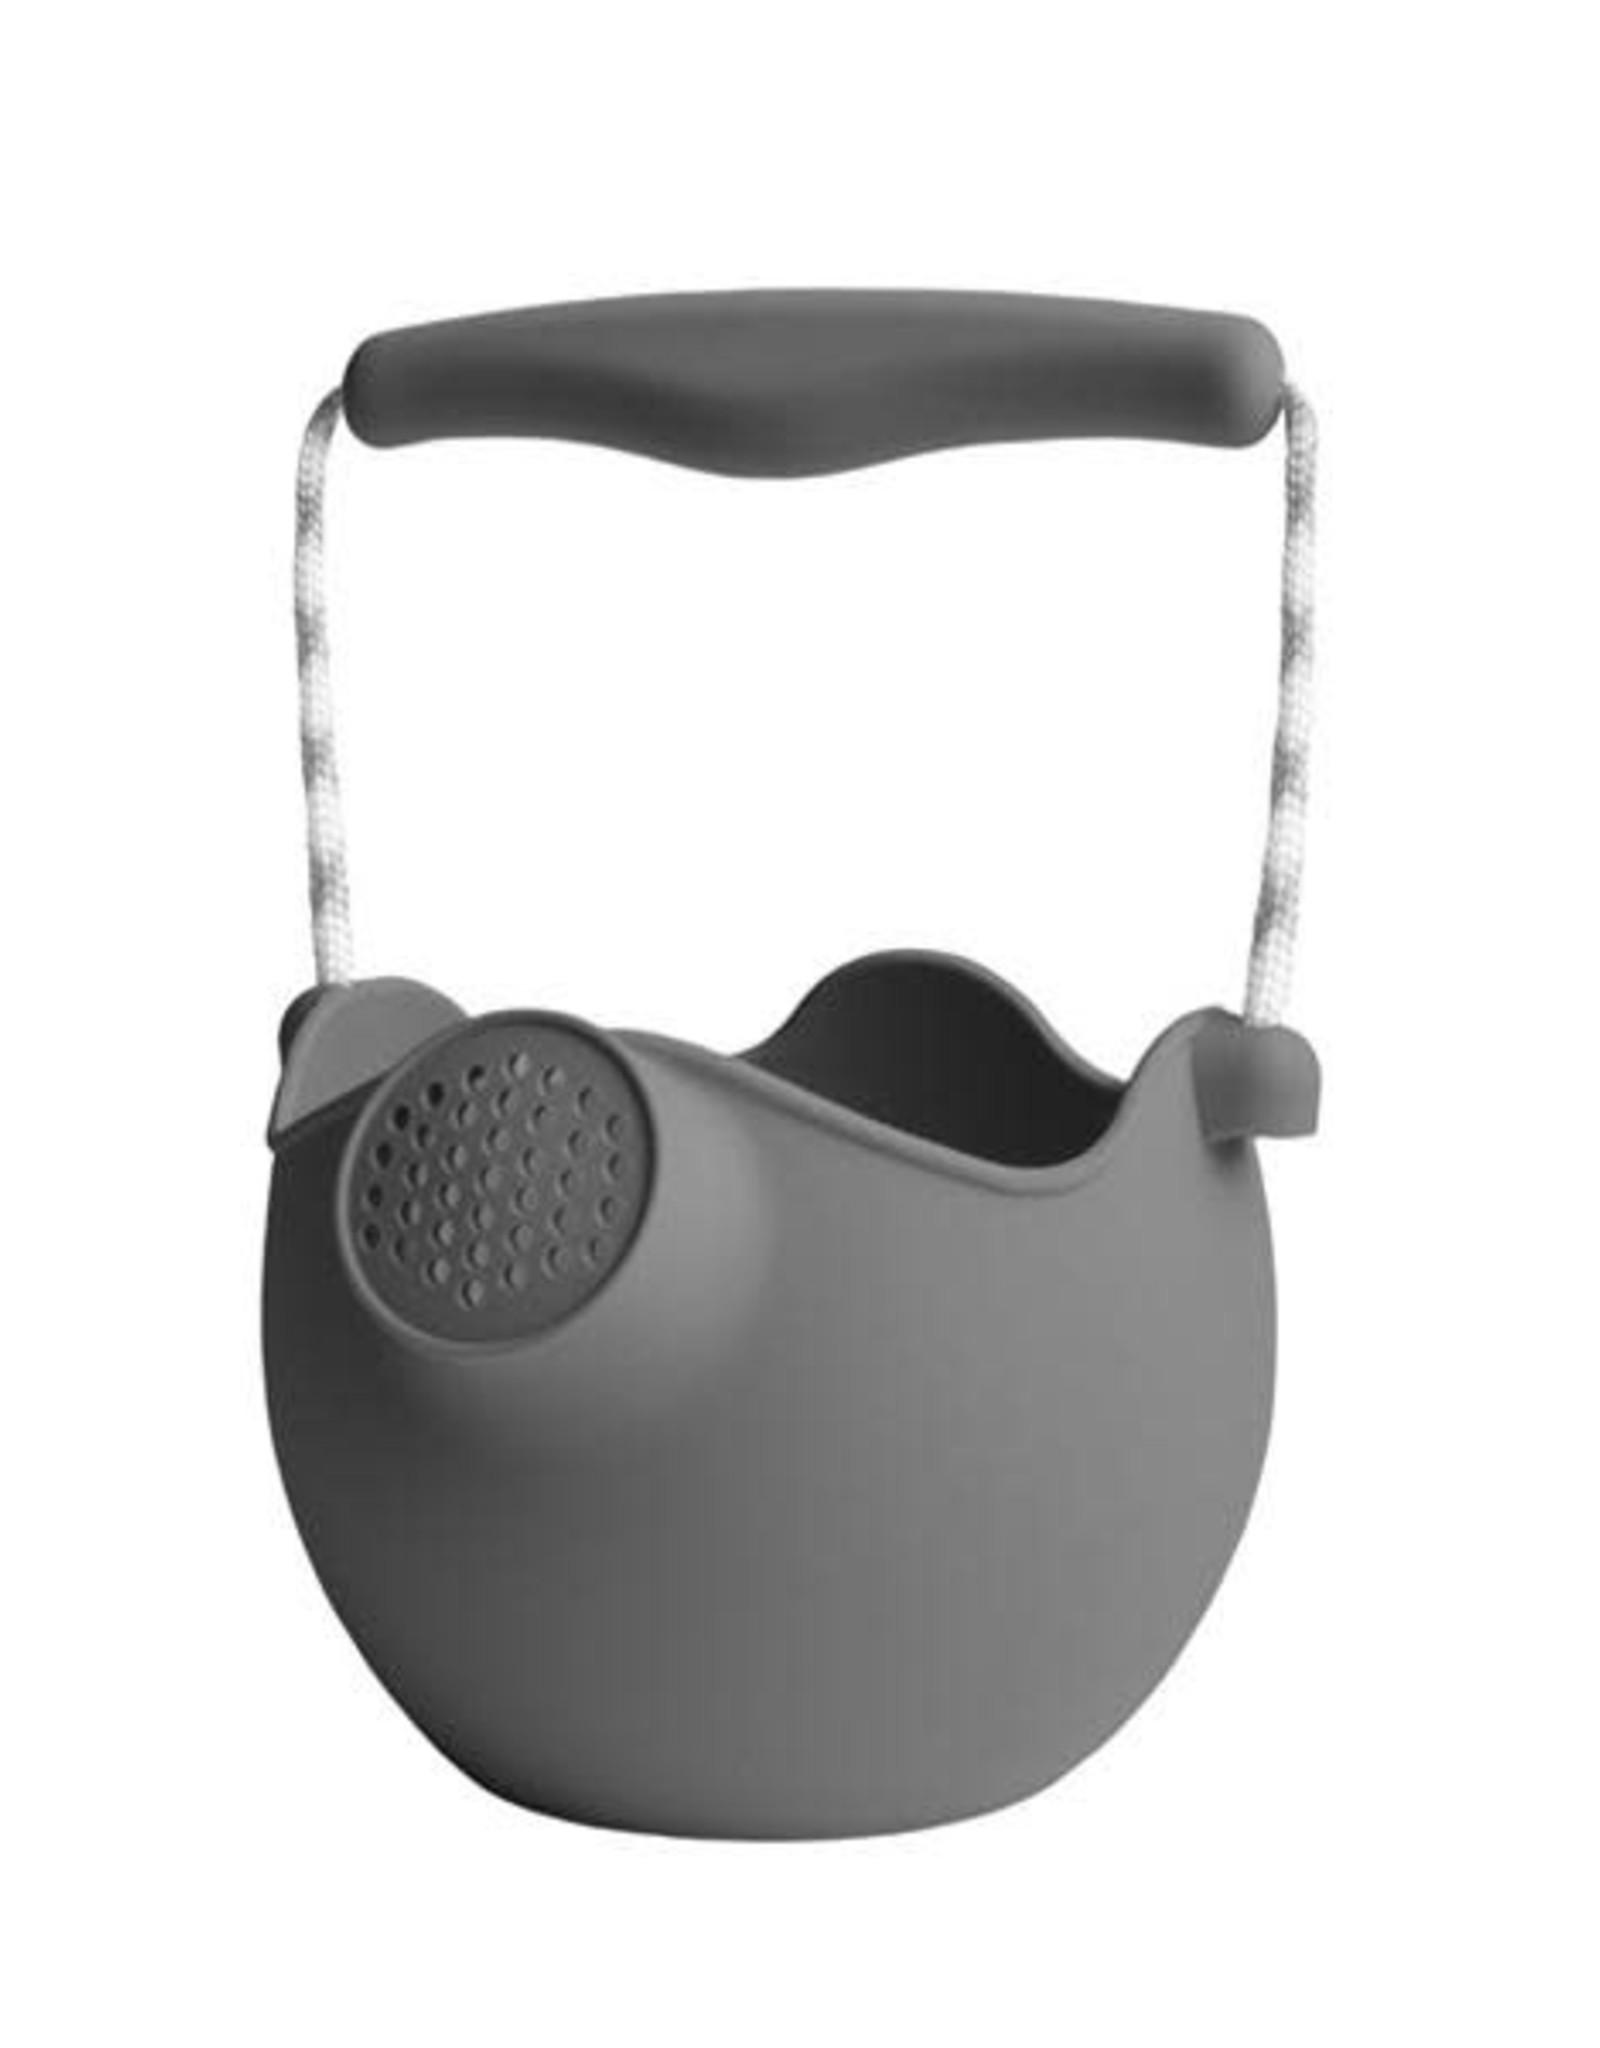 BIBS Scrunch Watering Can - Cool Grey